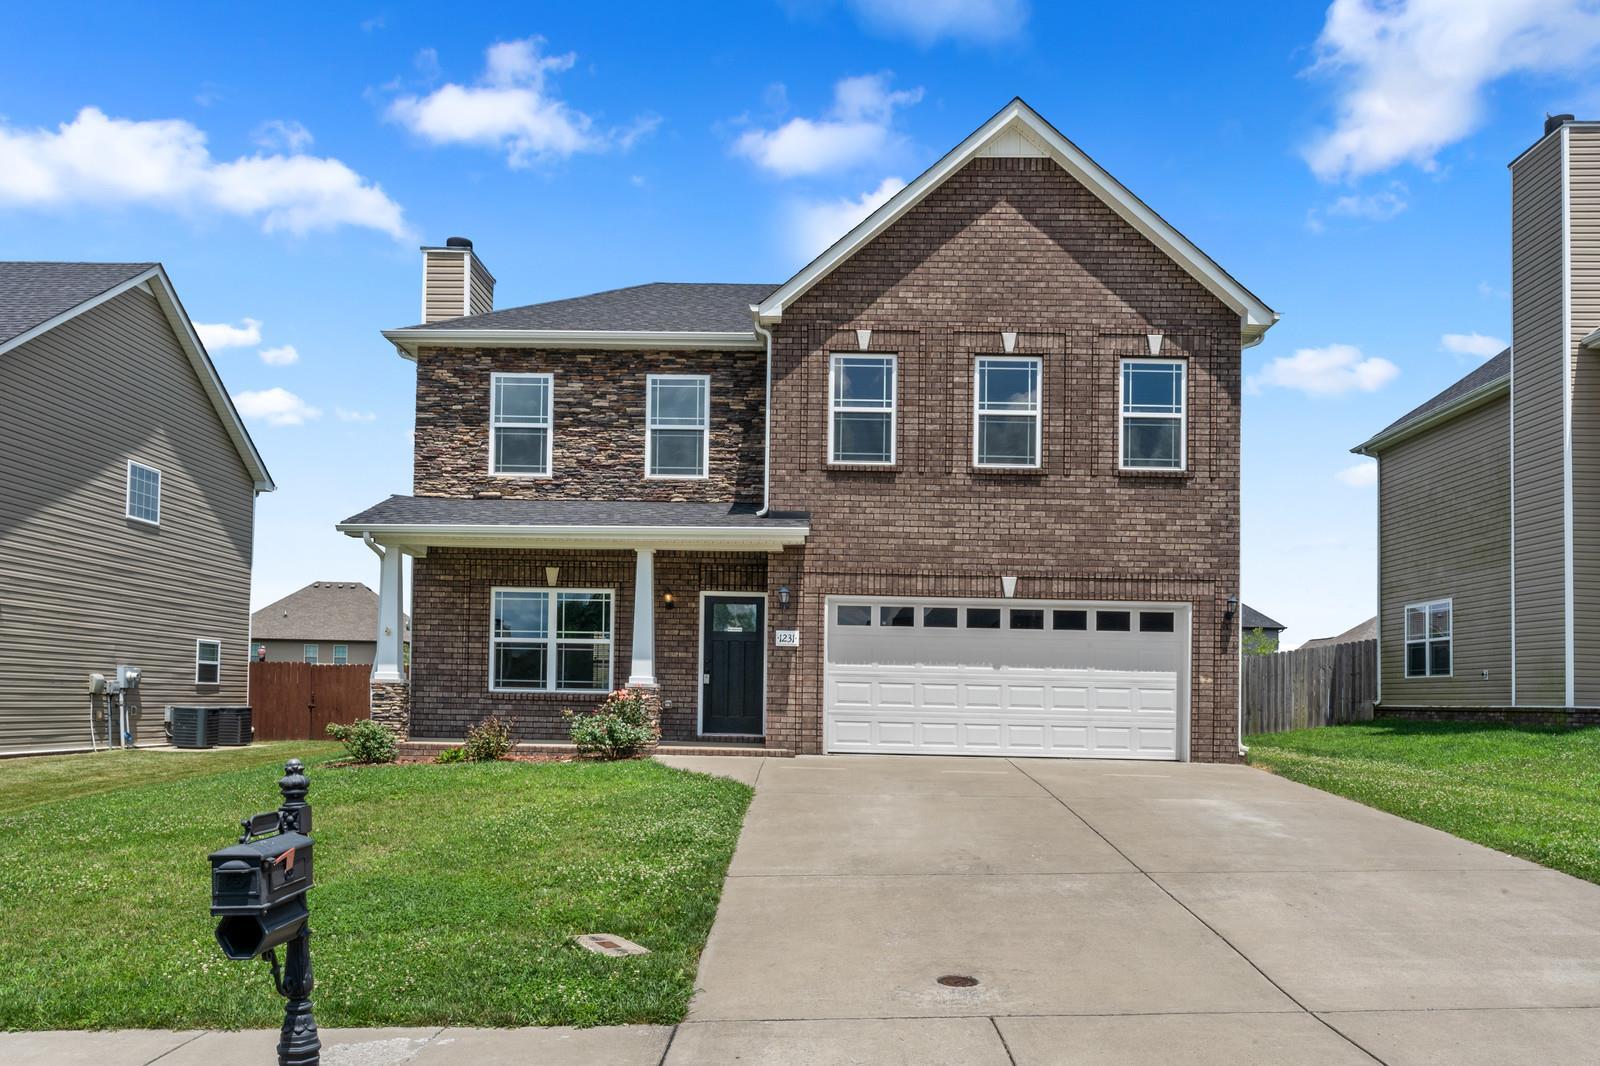 1231 Snowball Ln, Clarksville, TN 37042 - Clarksville, TN real estate listing